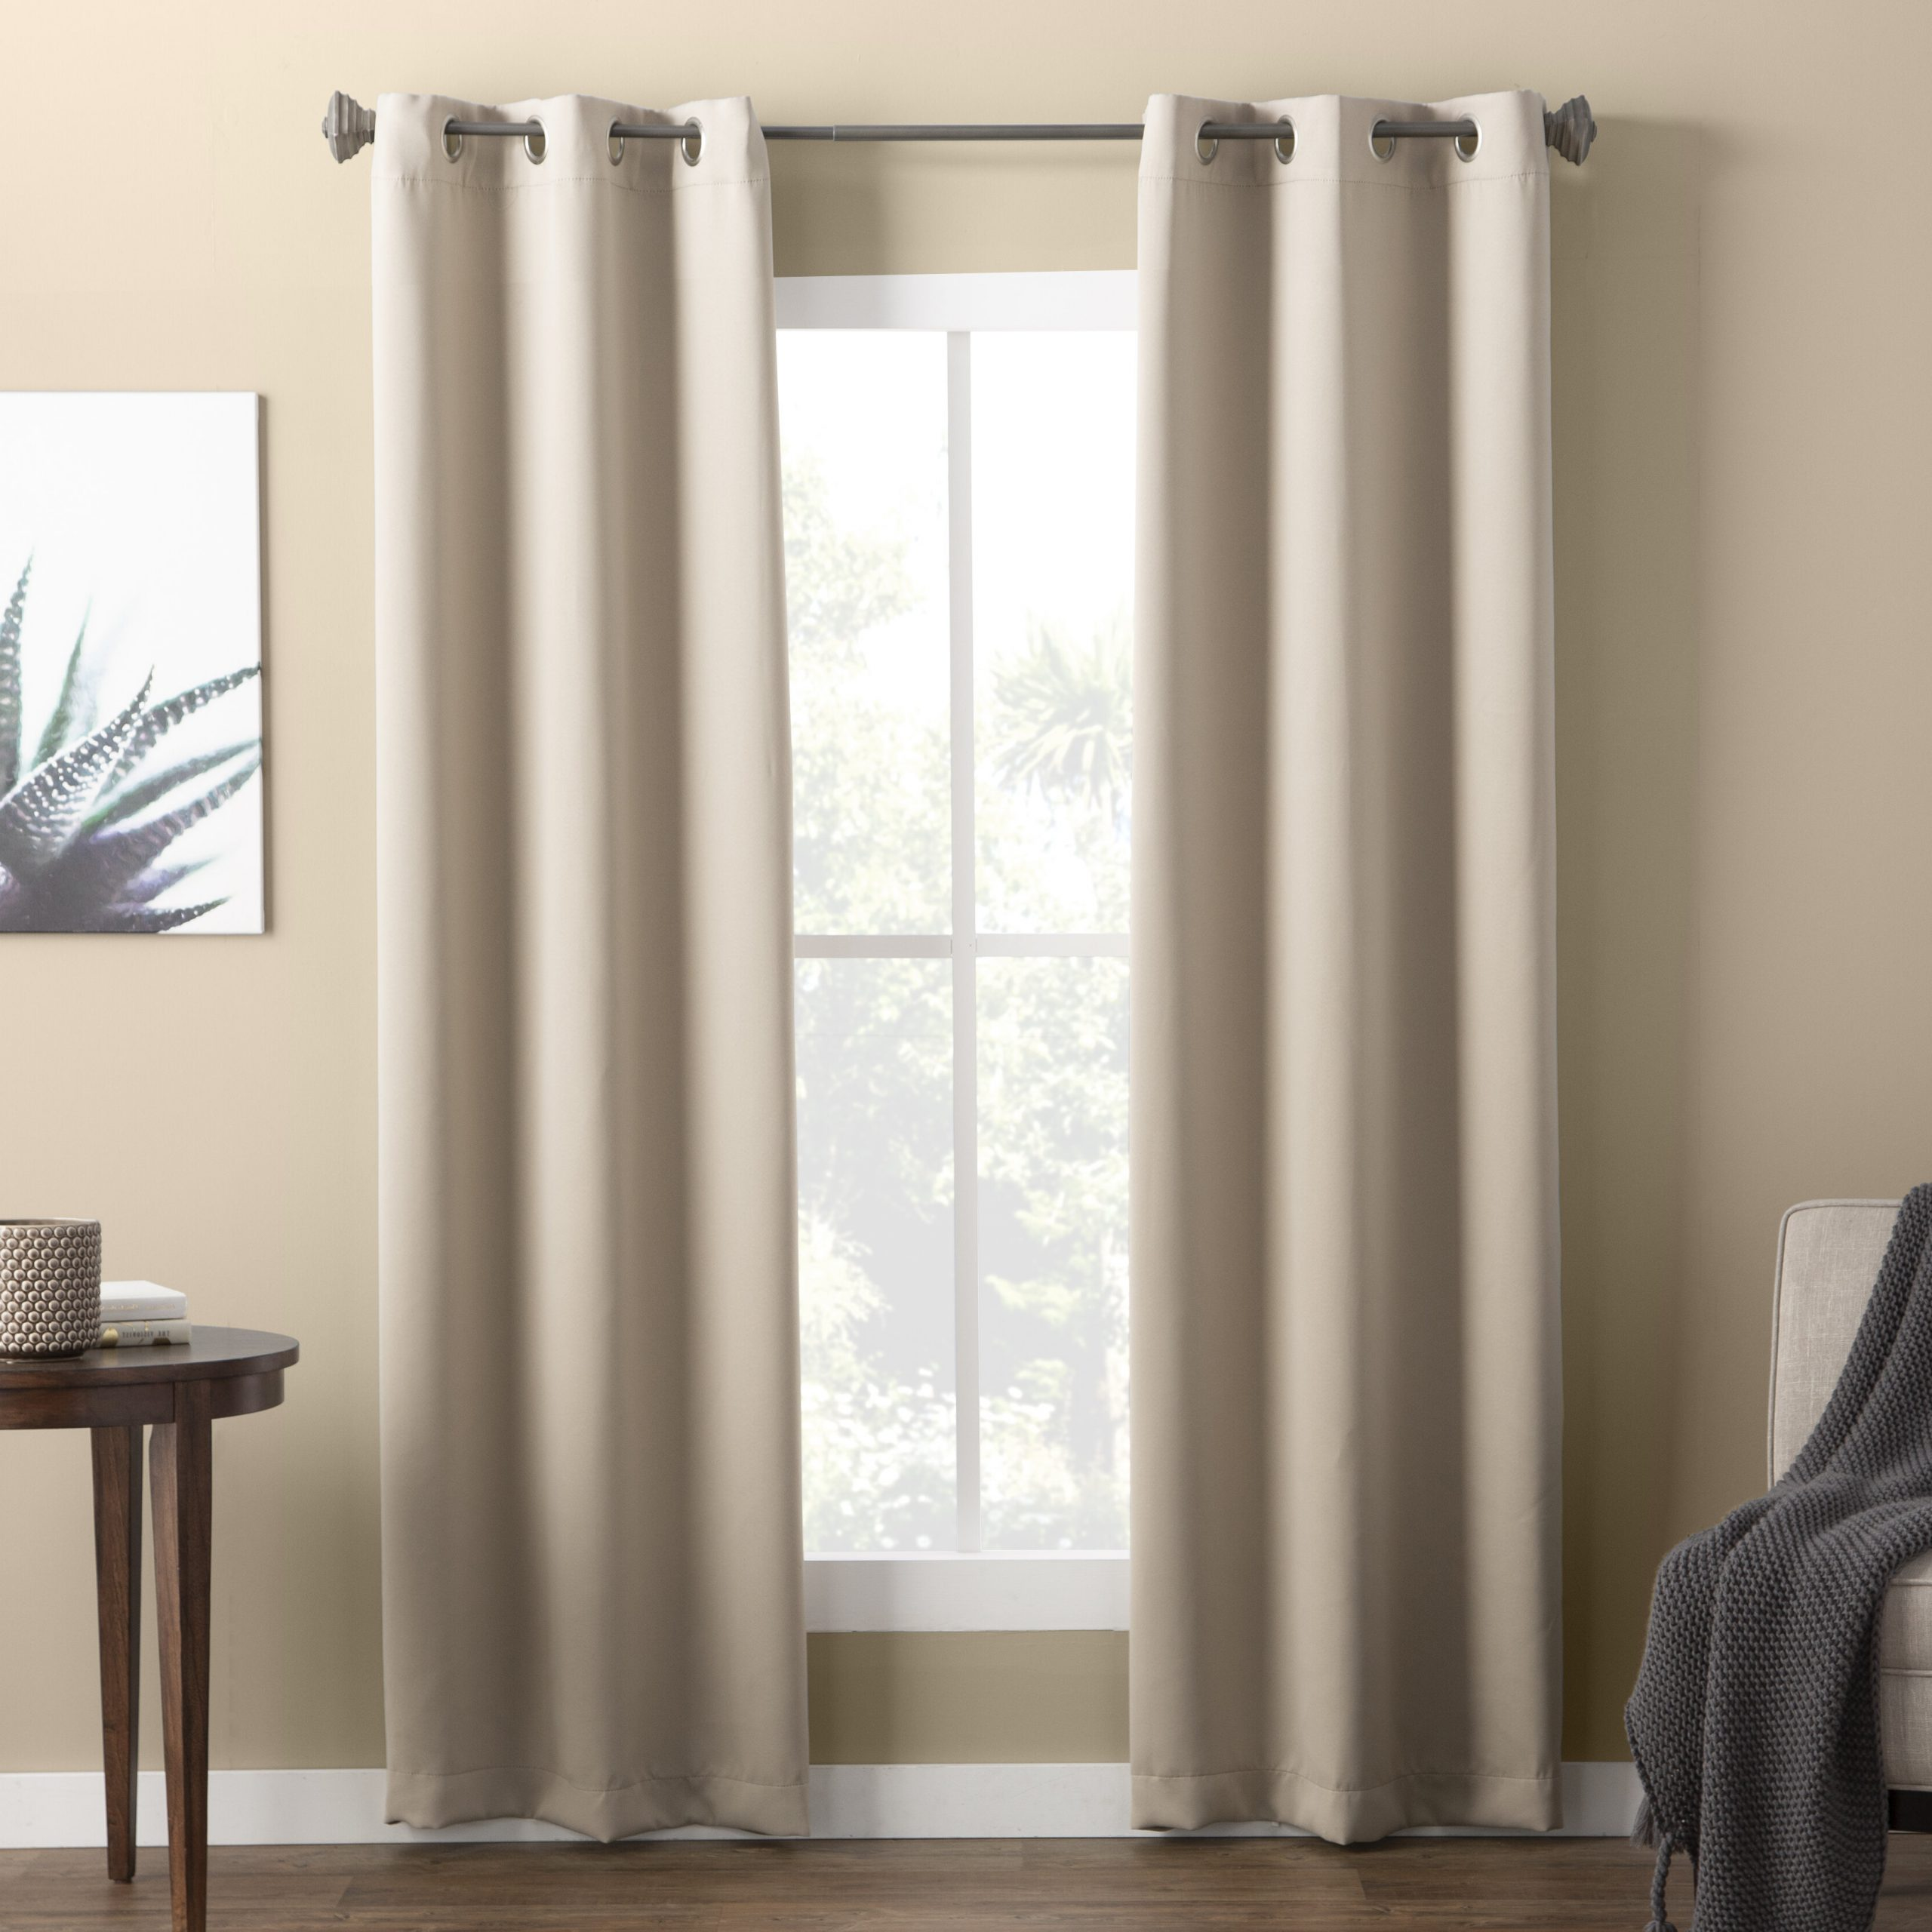 Wayfair Basics Solid Blackout Grommet Single Curtain Panel With Recent Warm Black Velvet Single Blackout Curtain Panels (View 13 of 20)